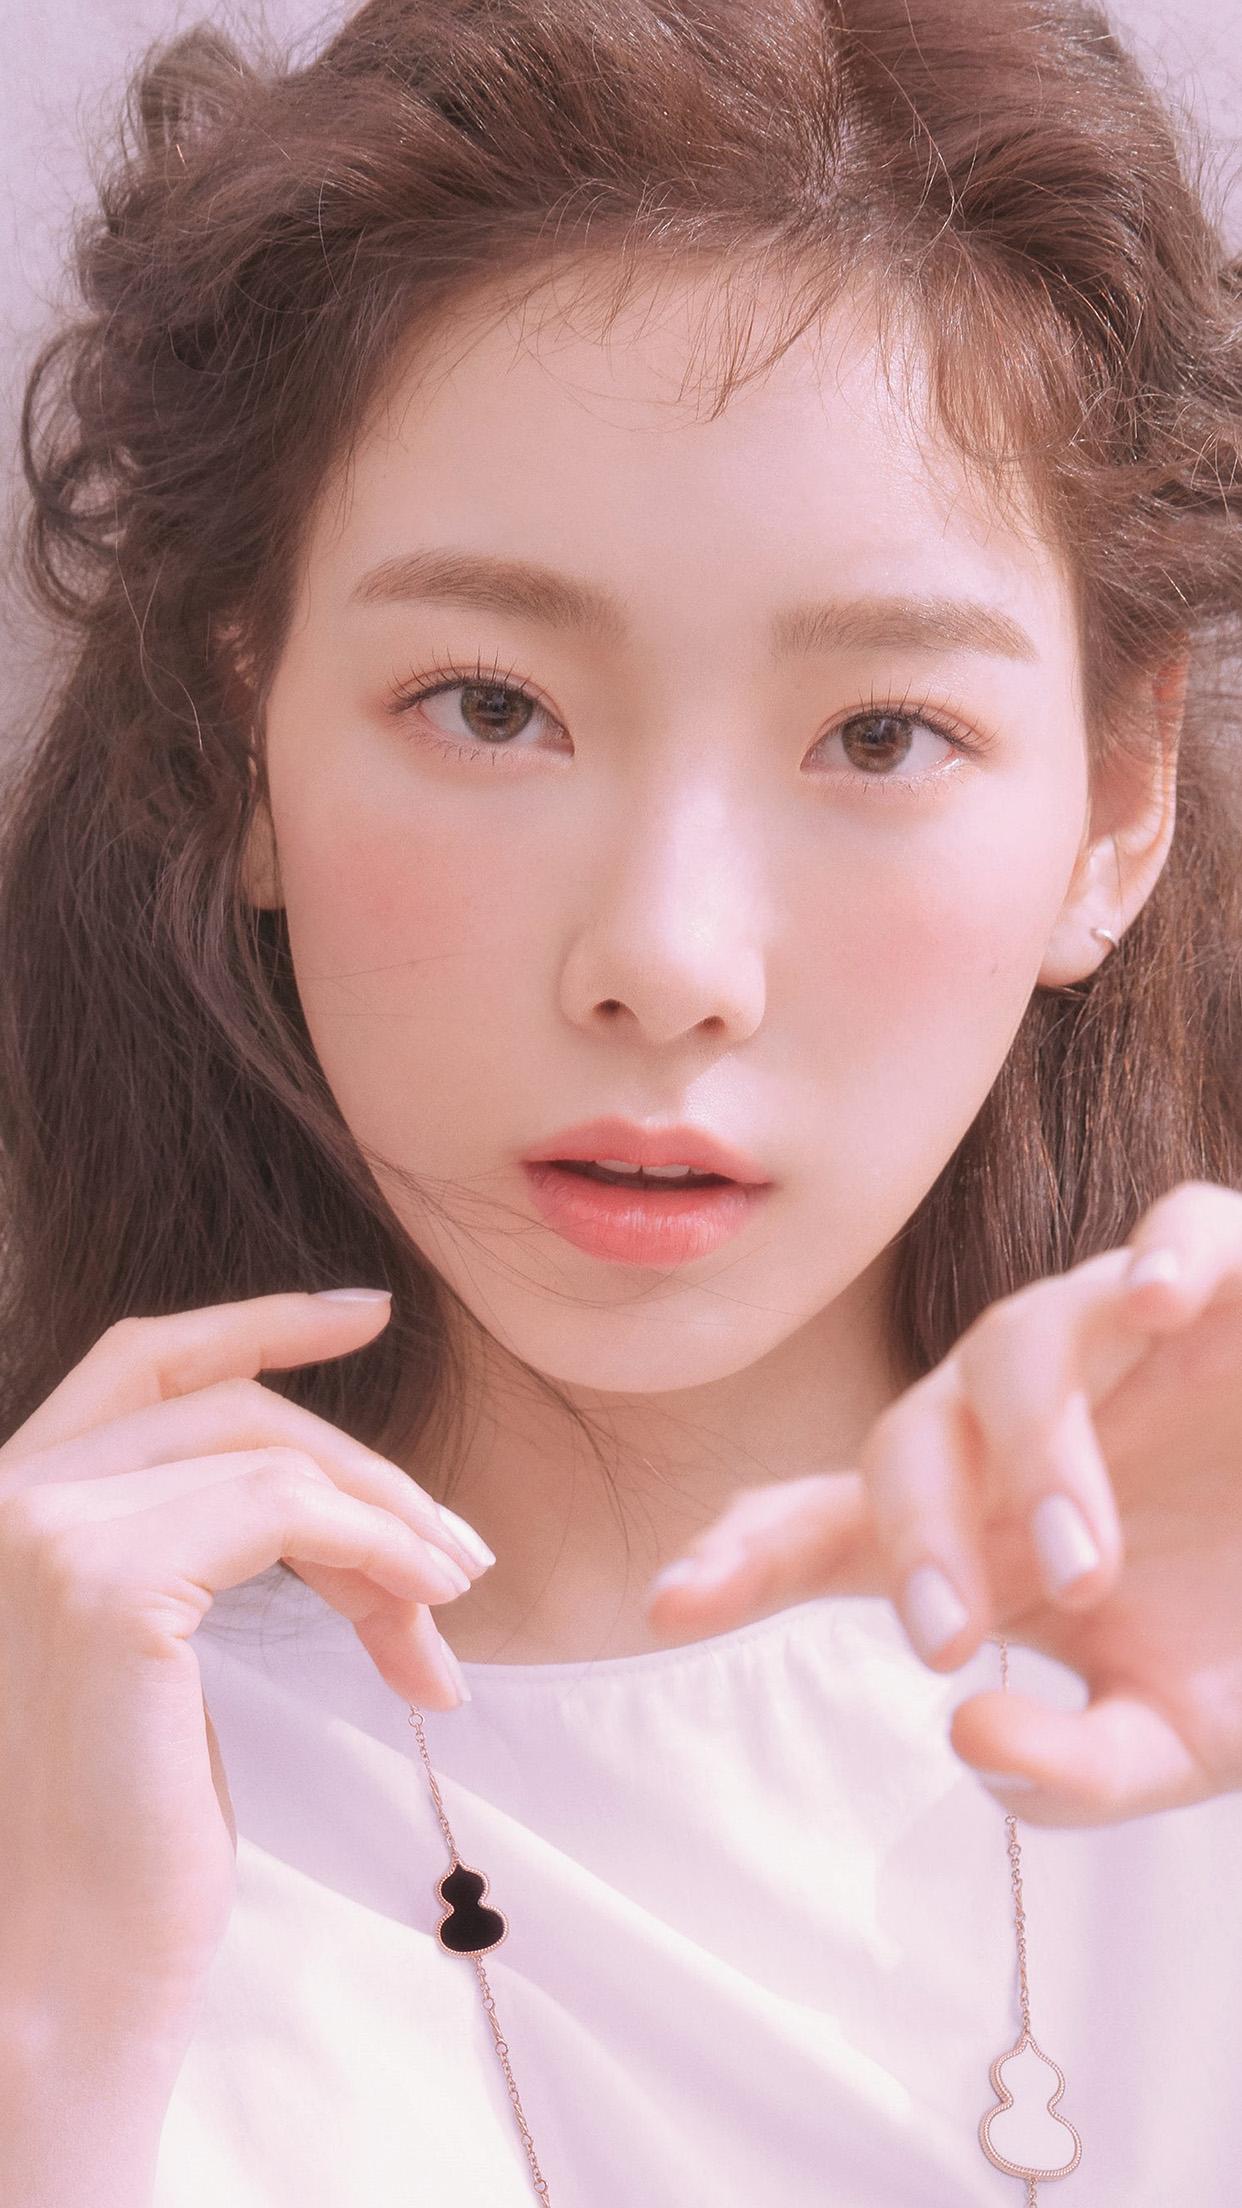 People 1242x2208 Korean K-pop women portrait photography red lipstick Kim Taeyeon SNSD SNSD Taeyeon looking at viewer necklace